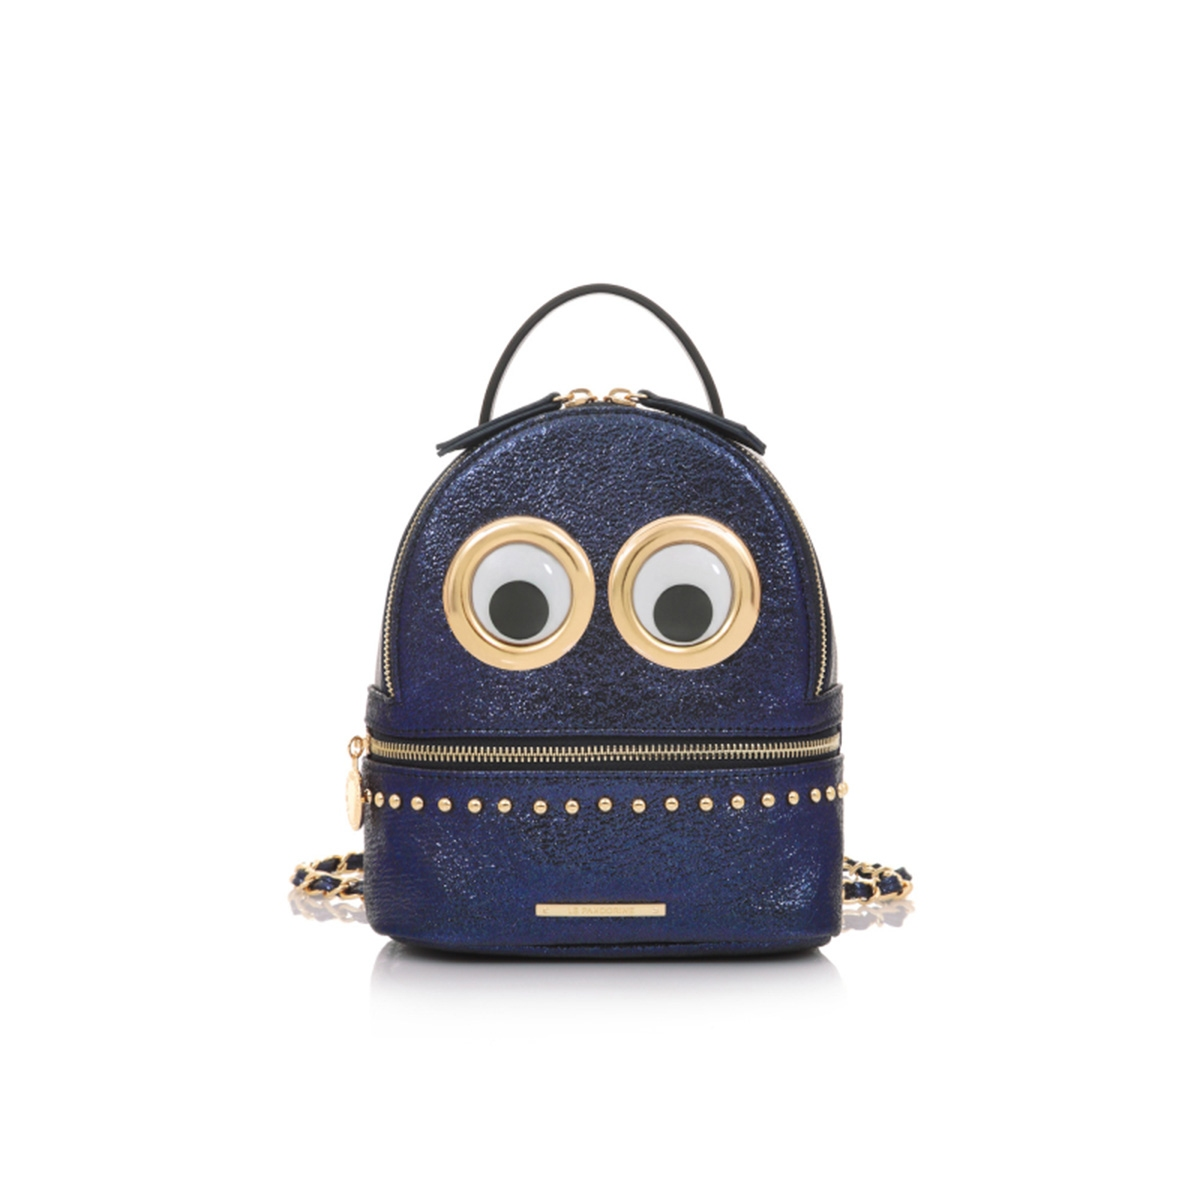 362291abb1 Σακίδιο Πλάτης Le Pandorine Eyes Mini Backpack DAJ02229-01 Μπλε Μοβ ...